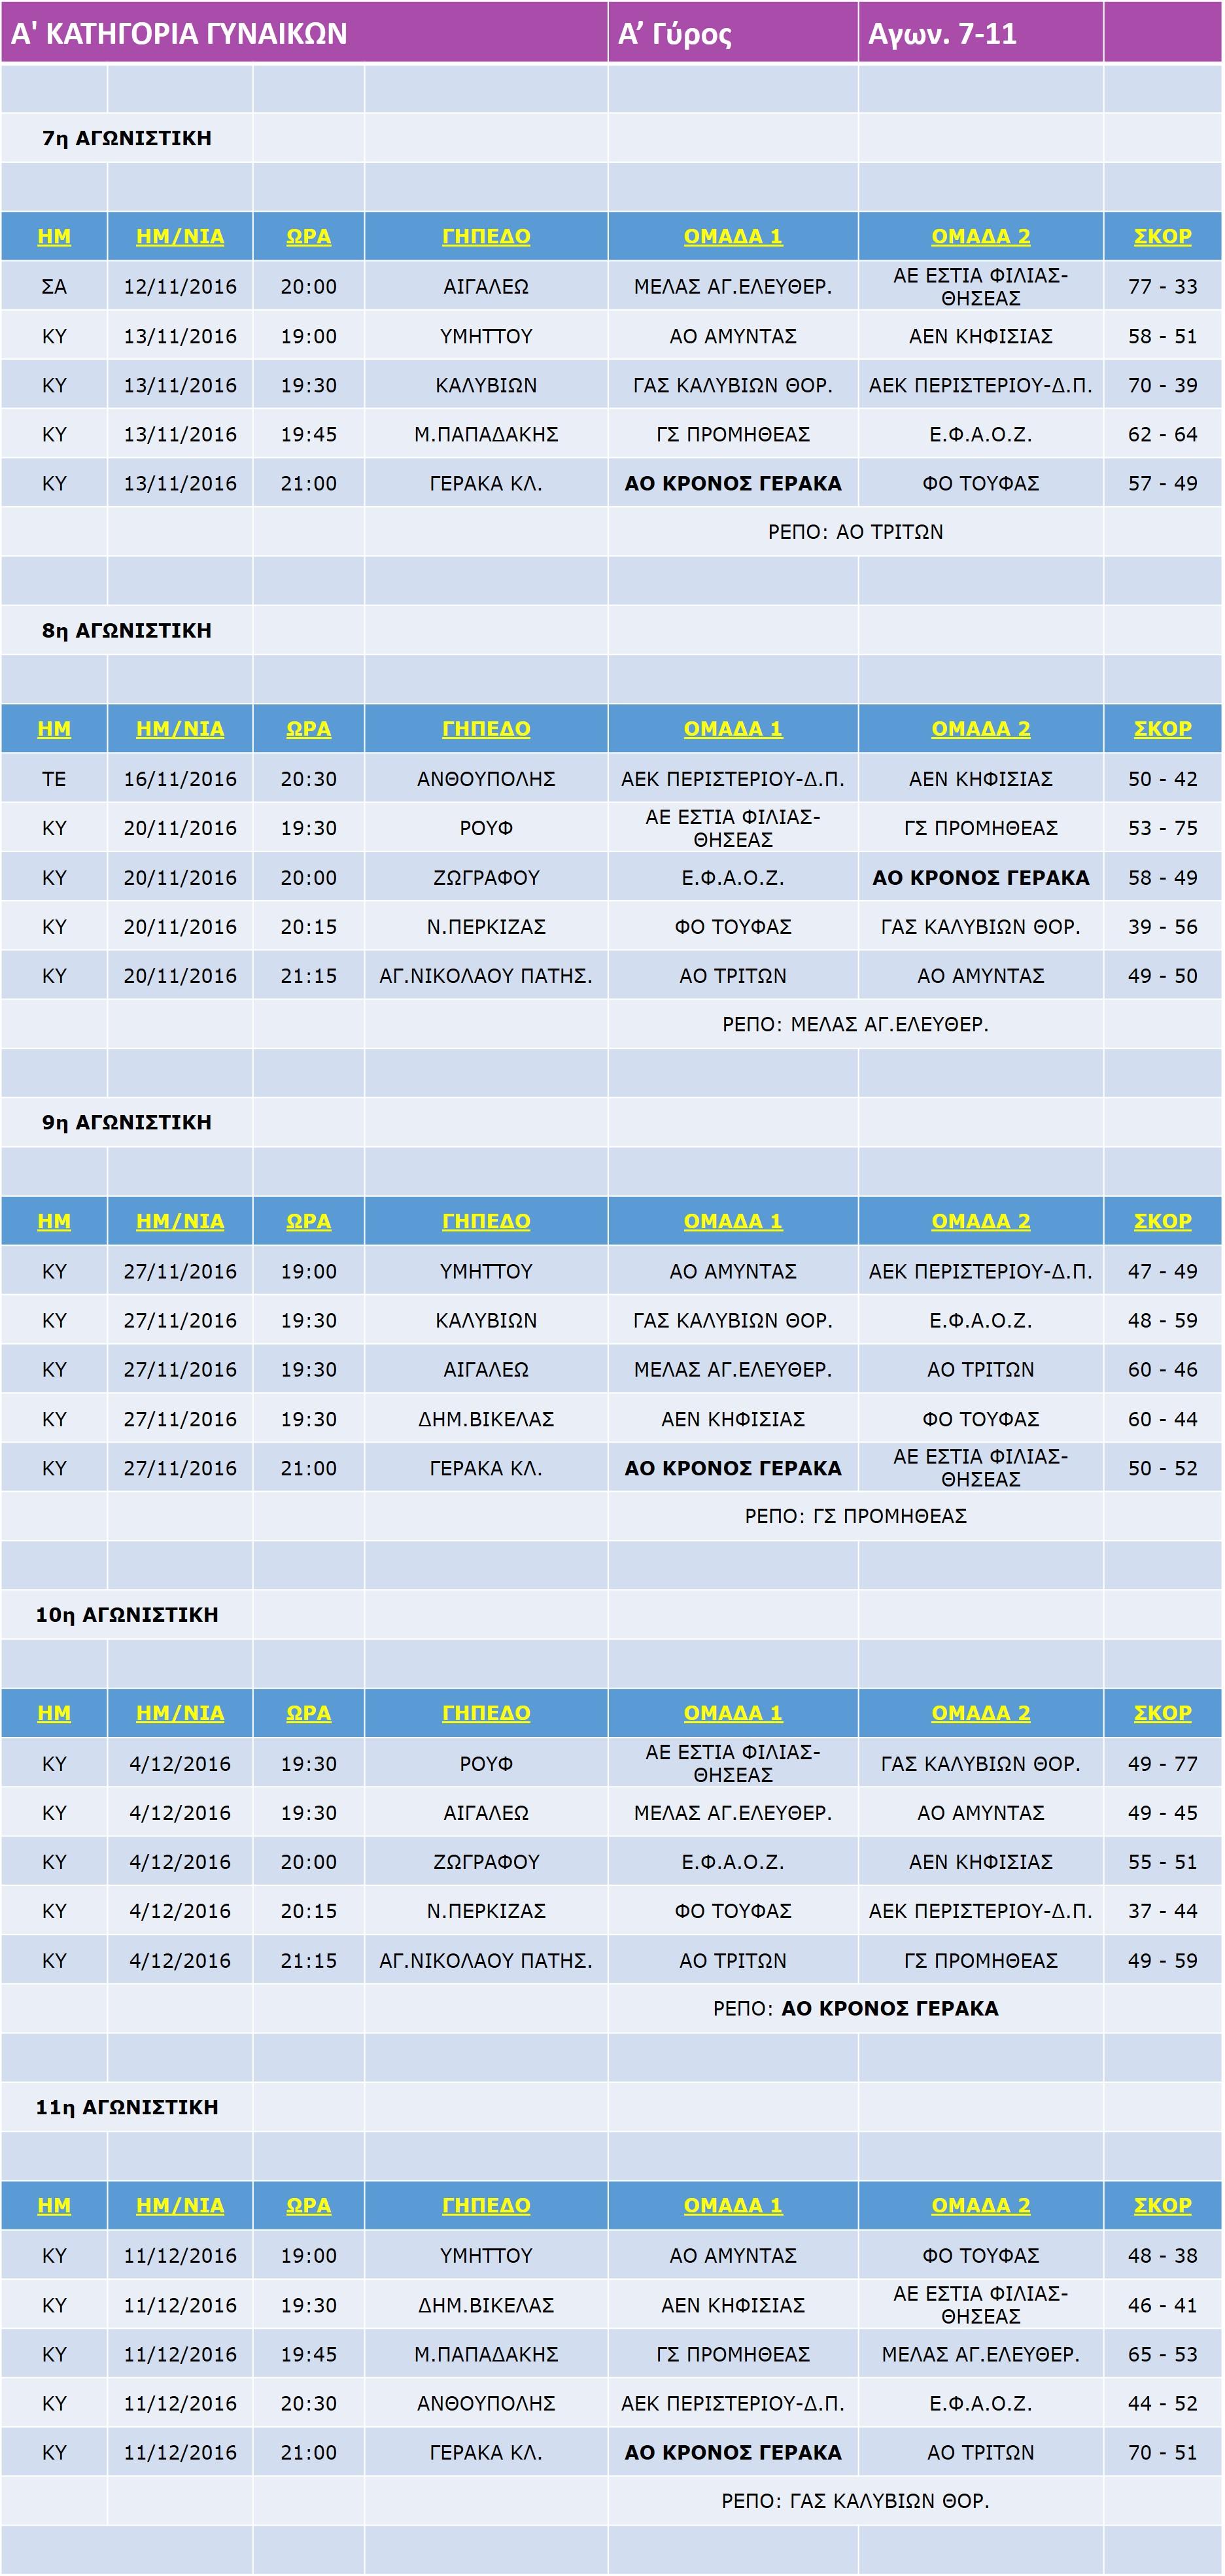 Gynaikes_Match_7-11_11